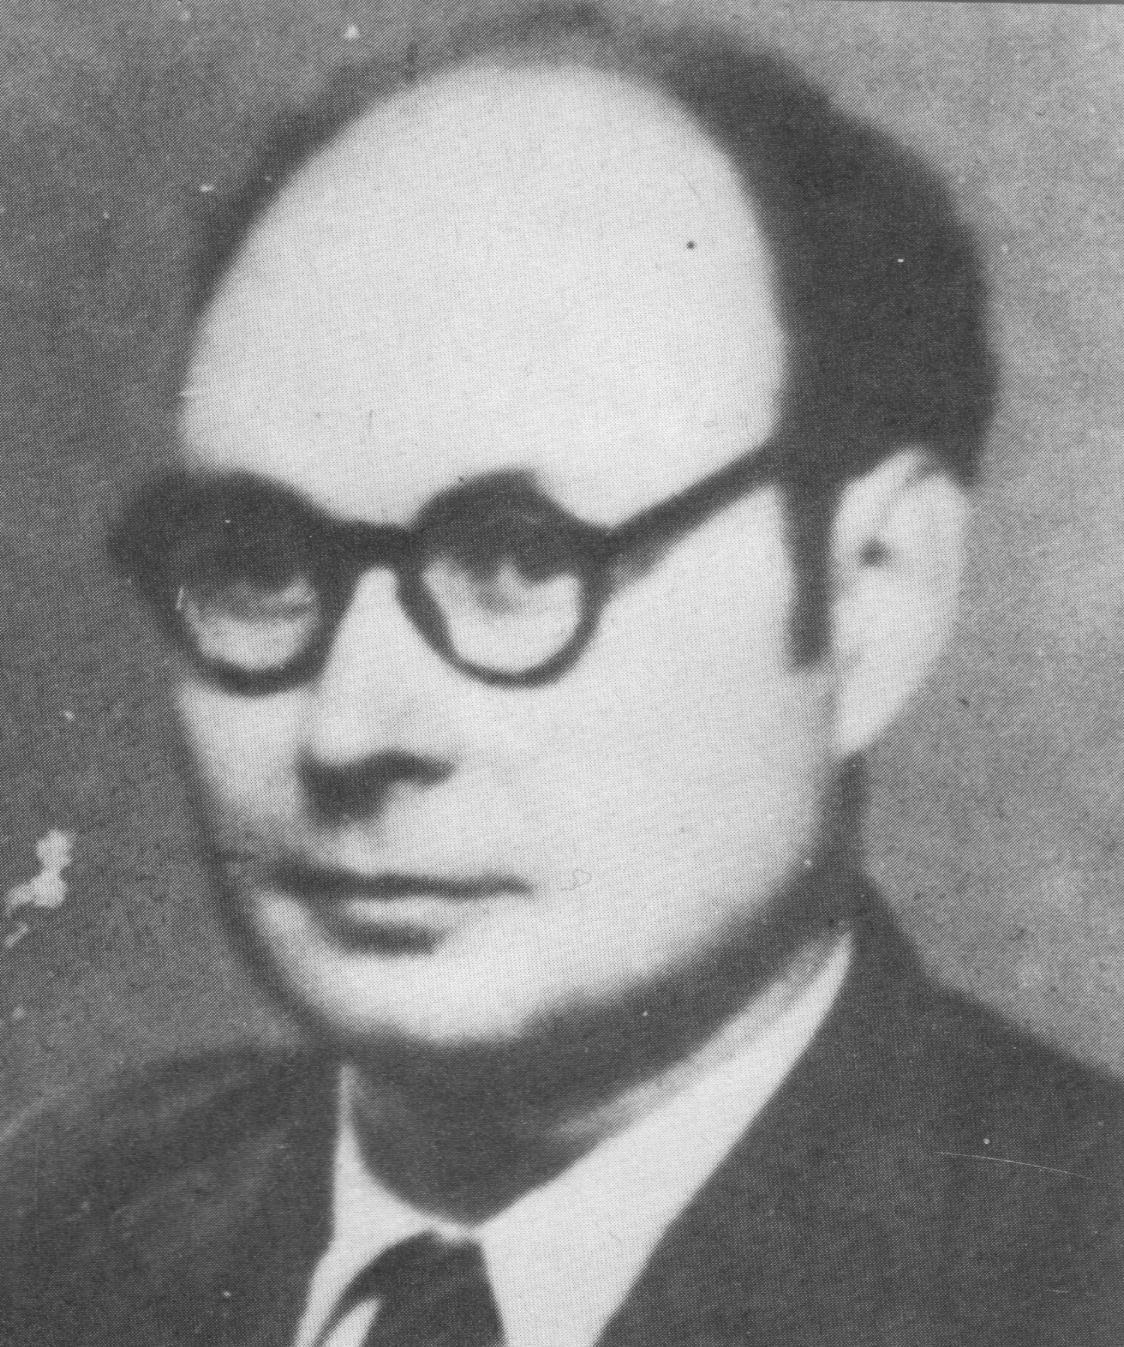 El tristemente famoso infiltrado Eliseo Melís Díaz.